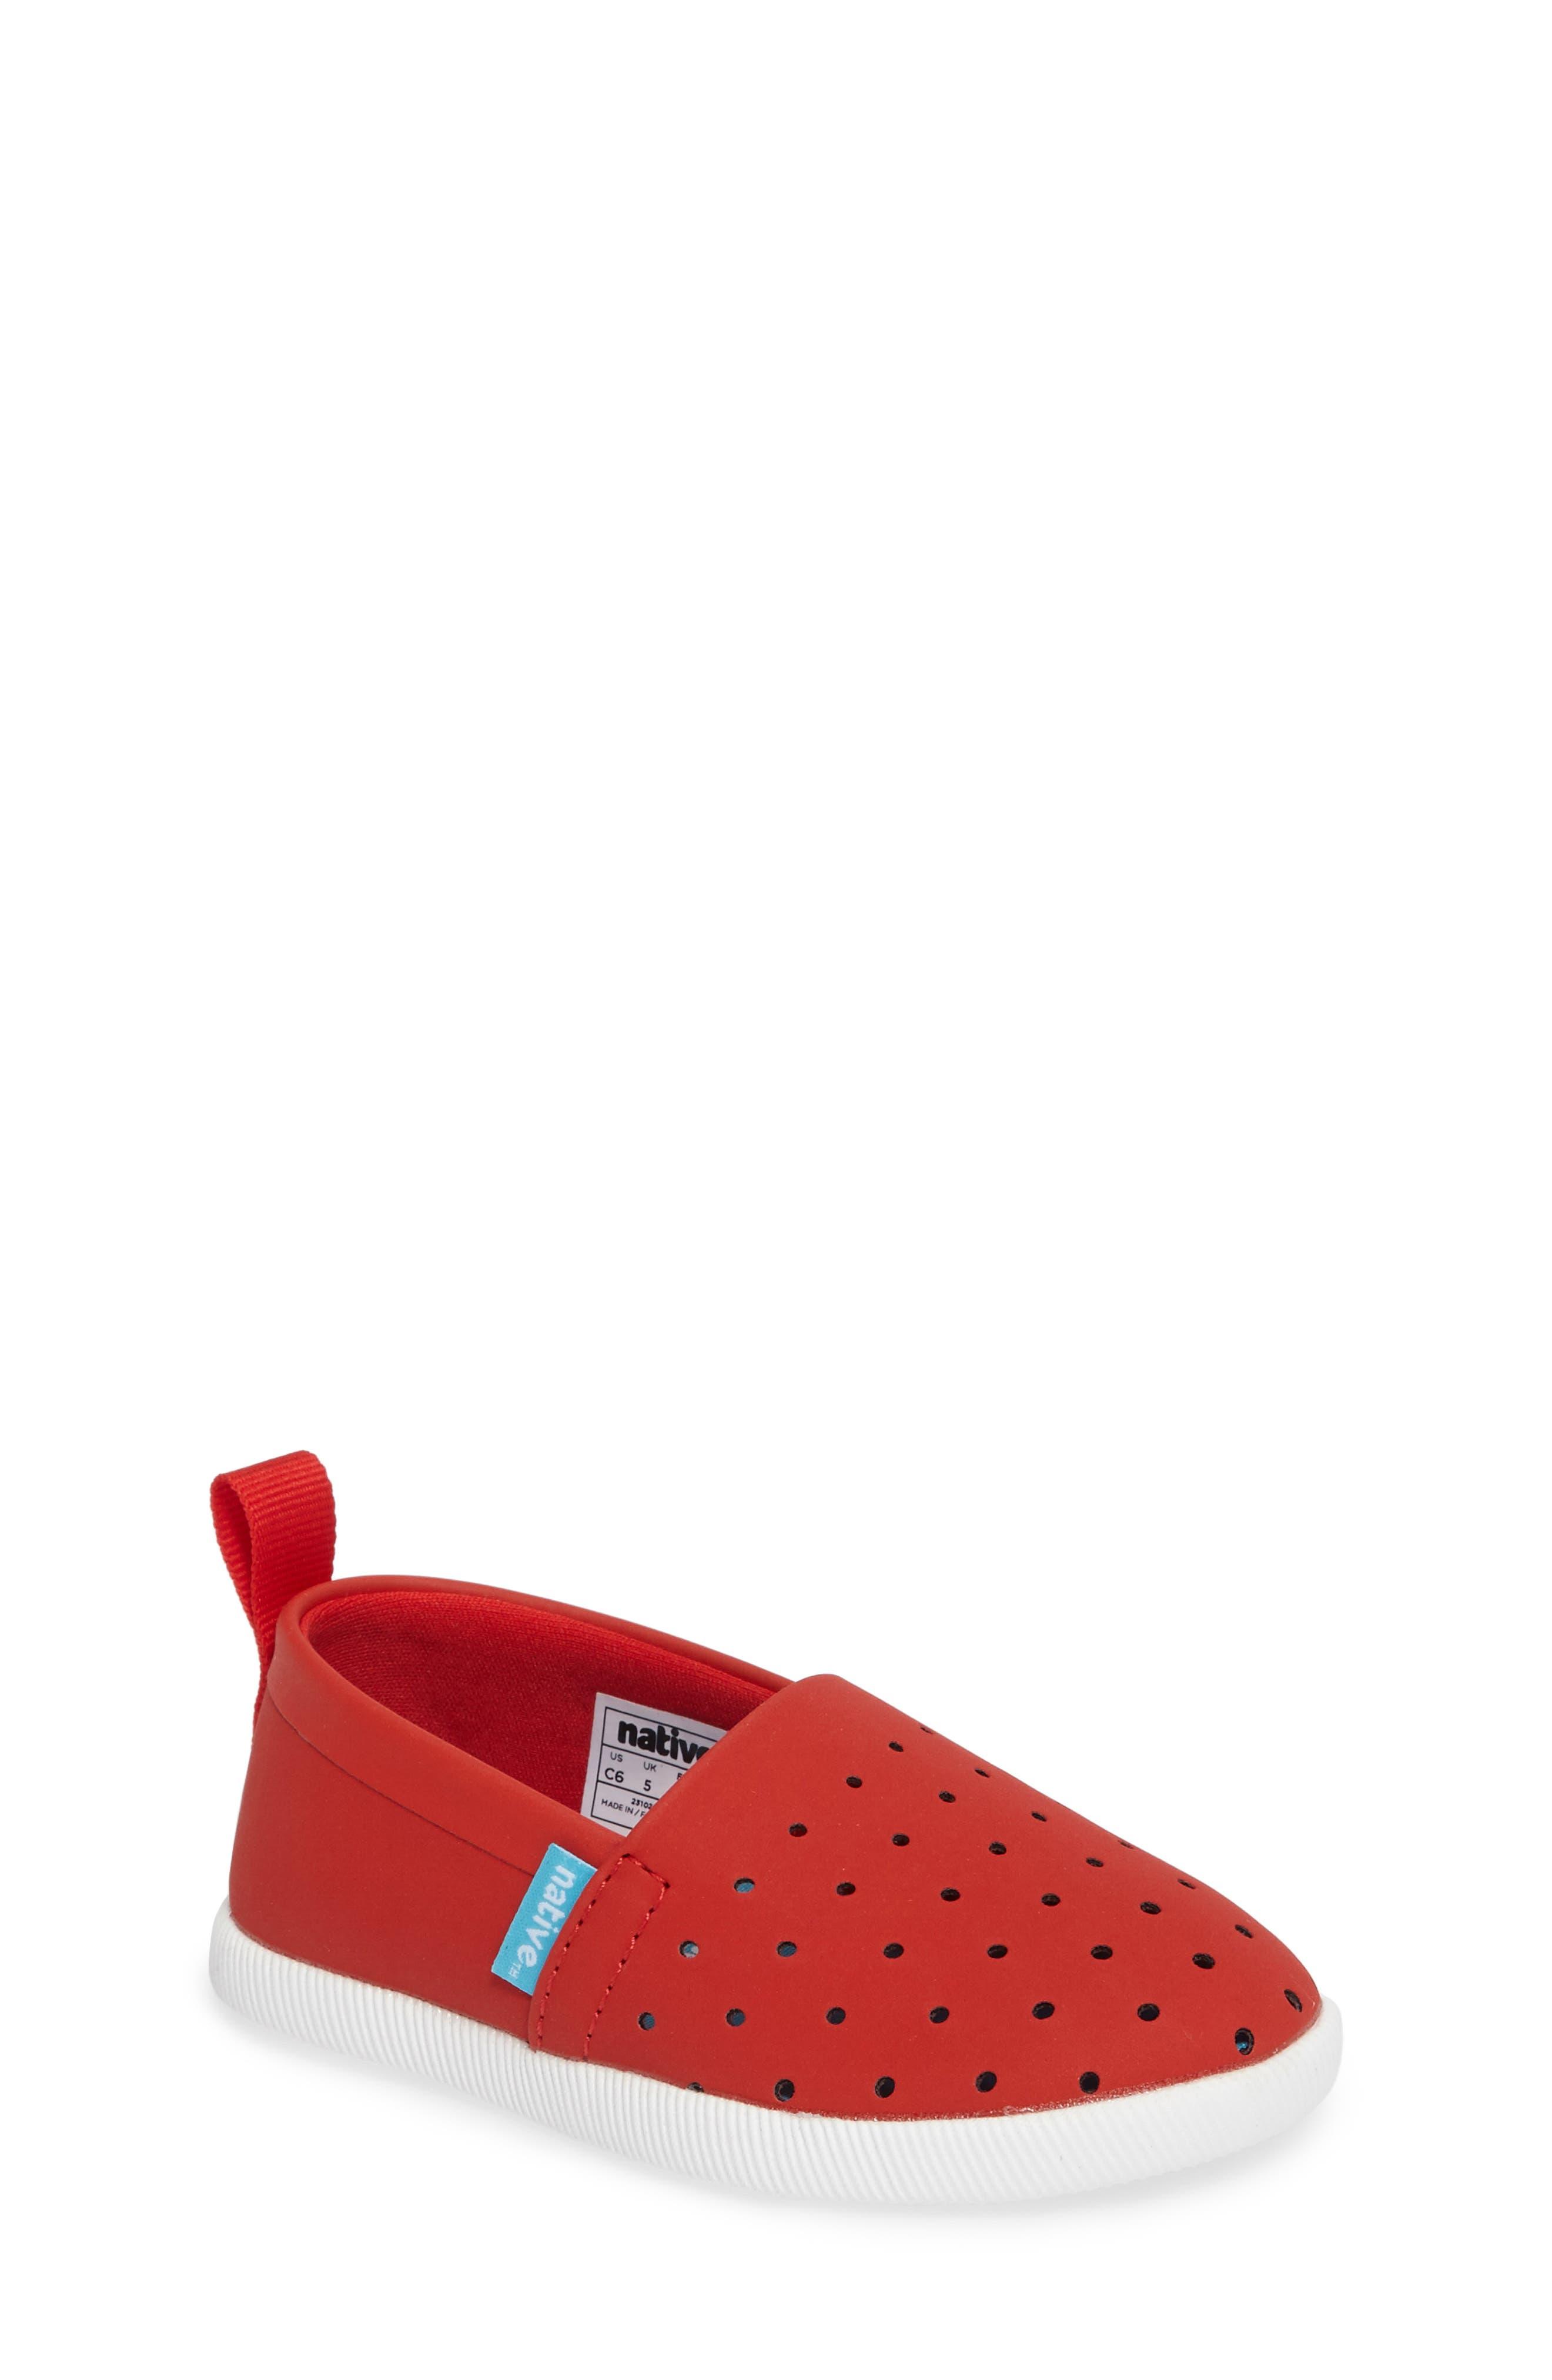 Native Shoes 'Venice' Slip-On (Baby, Walker, Toddler & Little Kid)